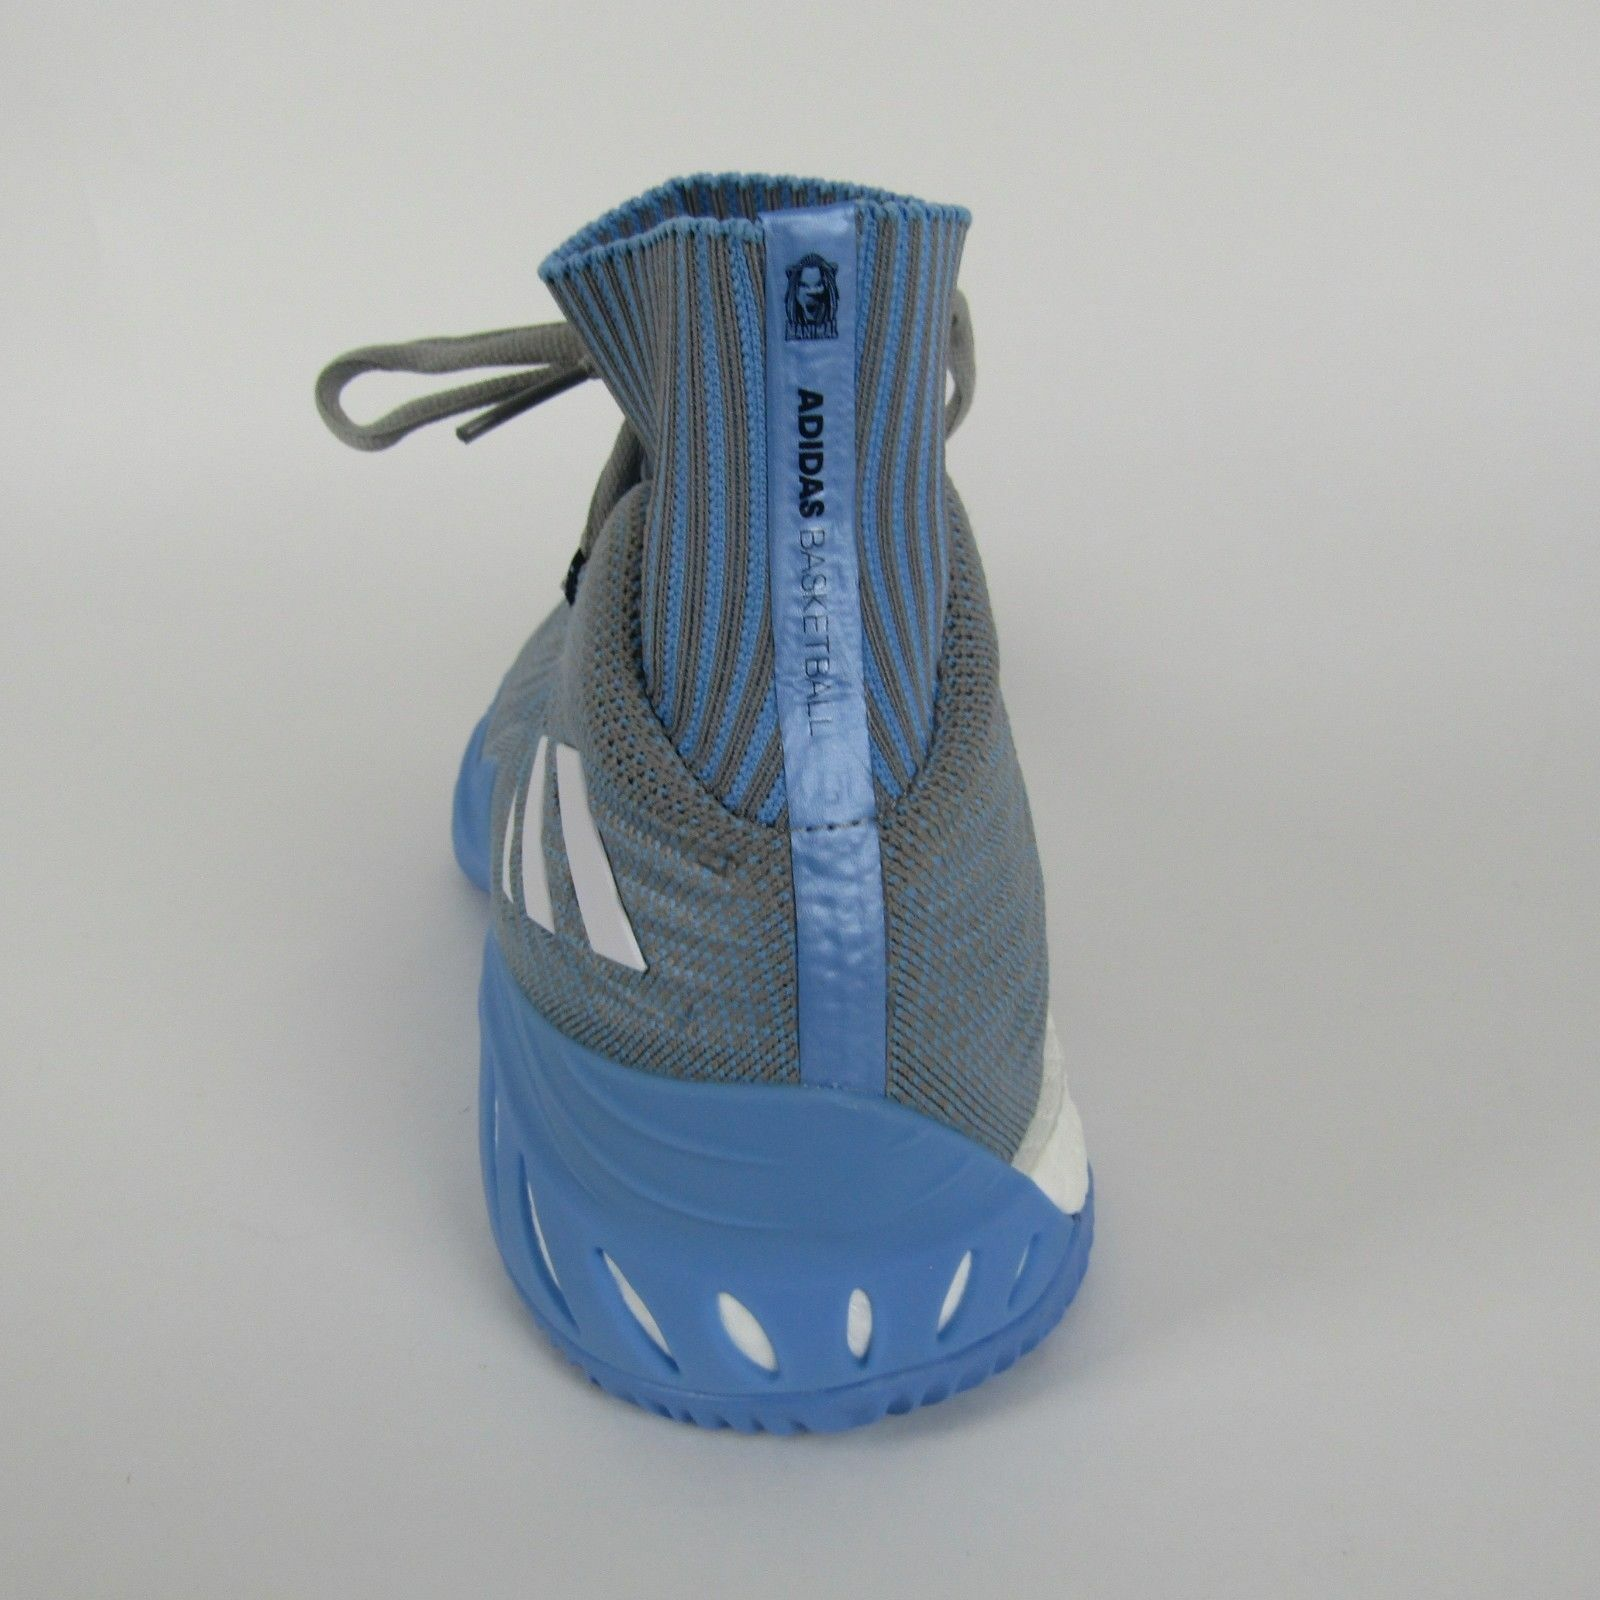 Adidas Crazy Esplosiva Primeknit Kenneth Sonia Ferrari Pe Pepite Nets AC8724 image 5